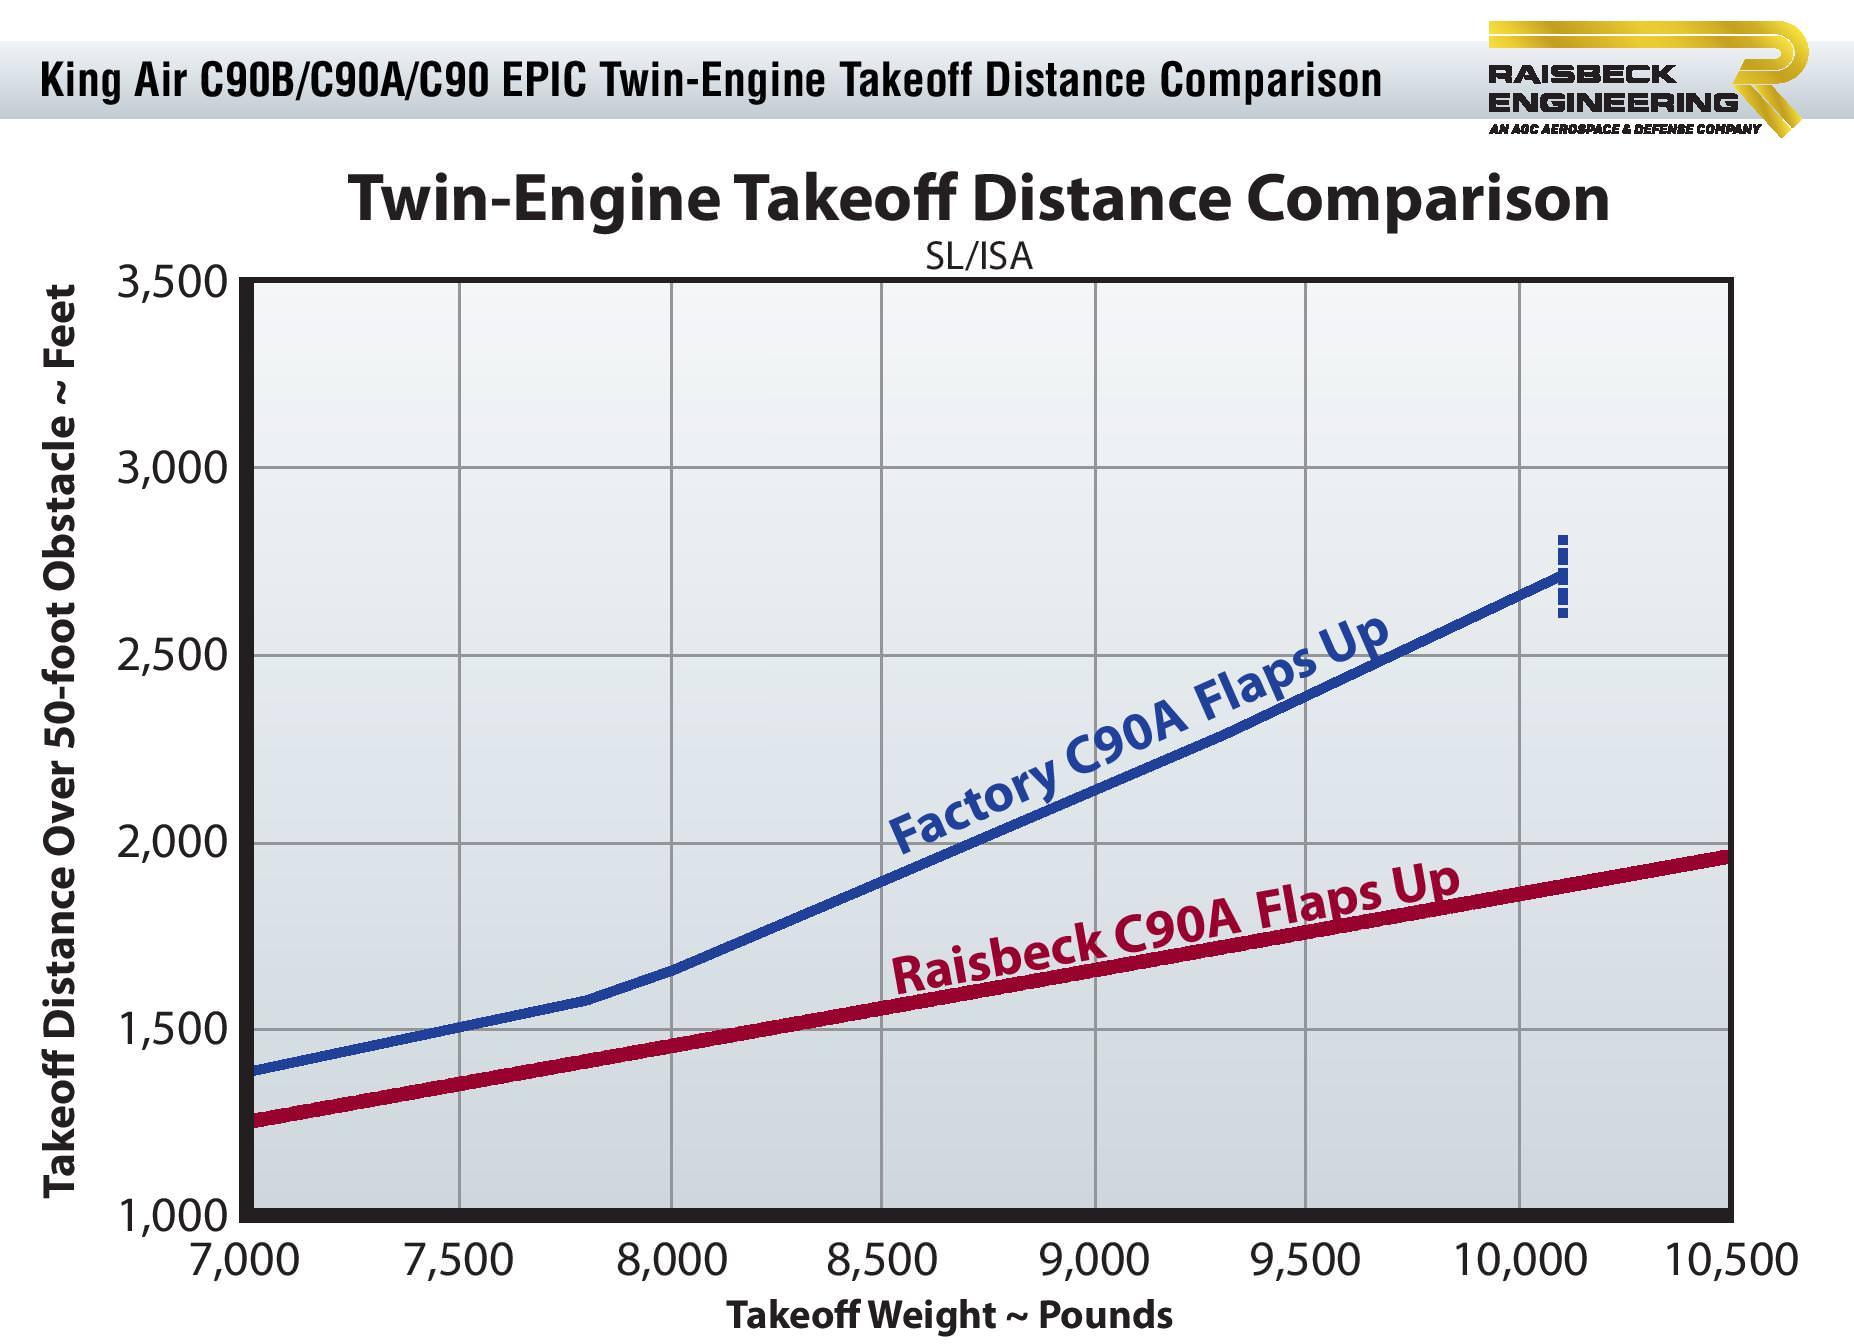 C90 EPIC Takeoff Distance Chart